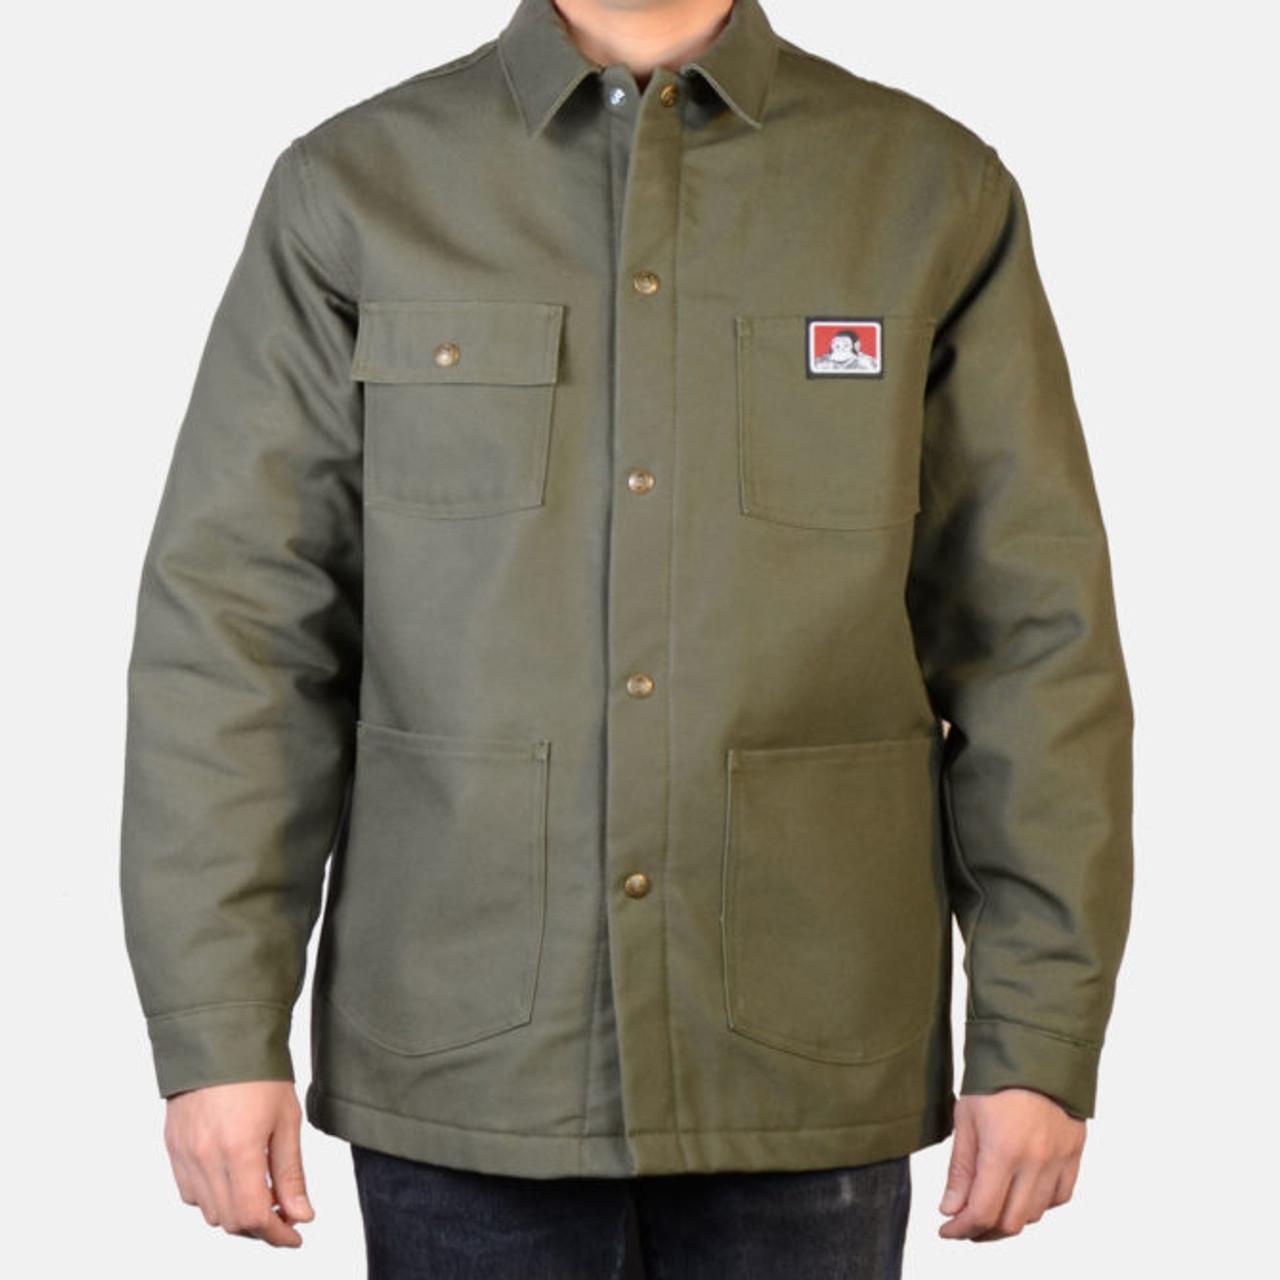 Ben Davis® Original Jacket Front Snap